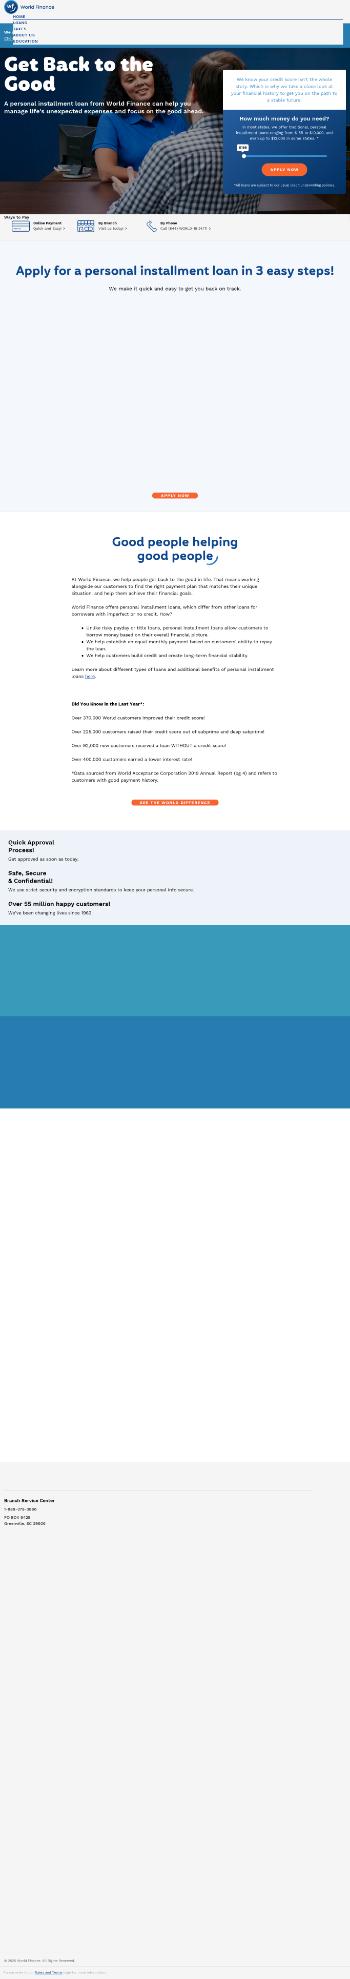 World Acceptance Corporation Website Screenshot